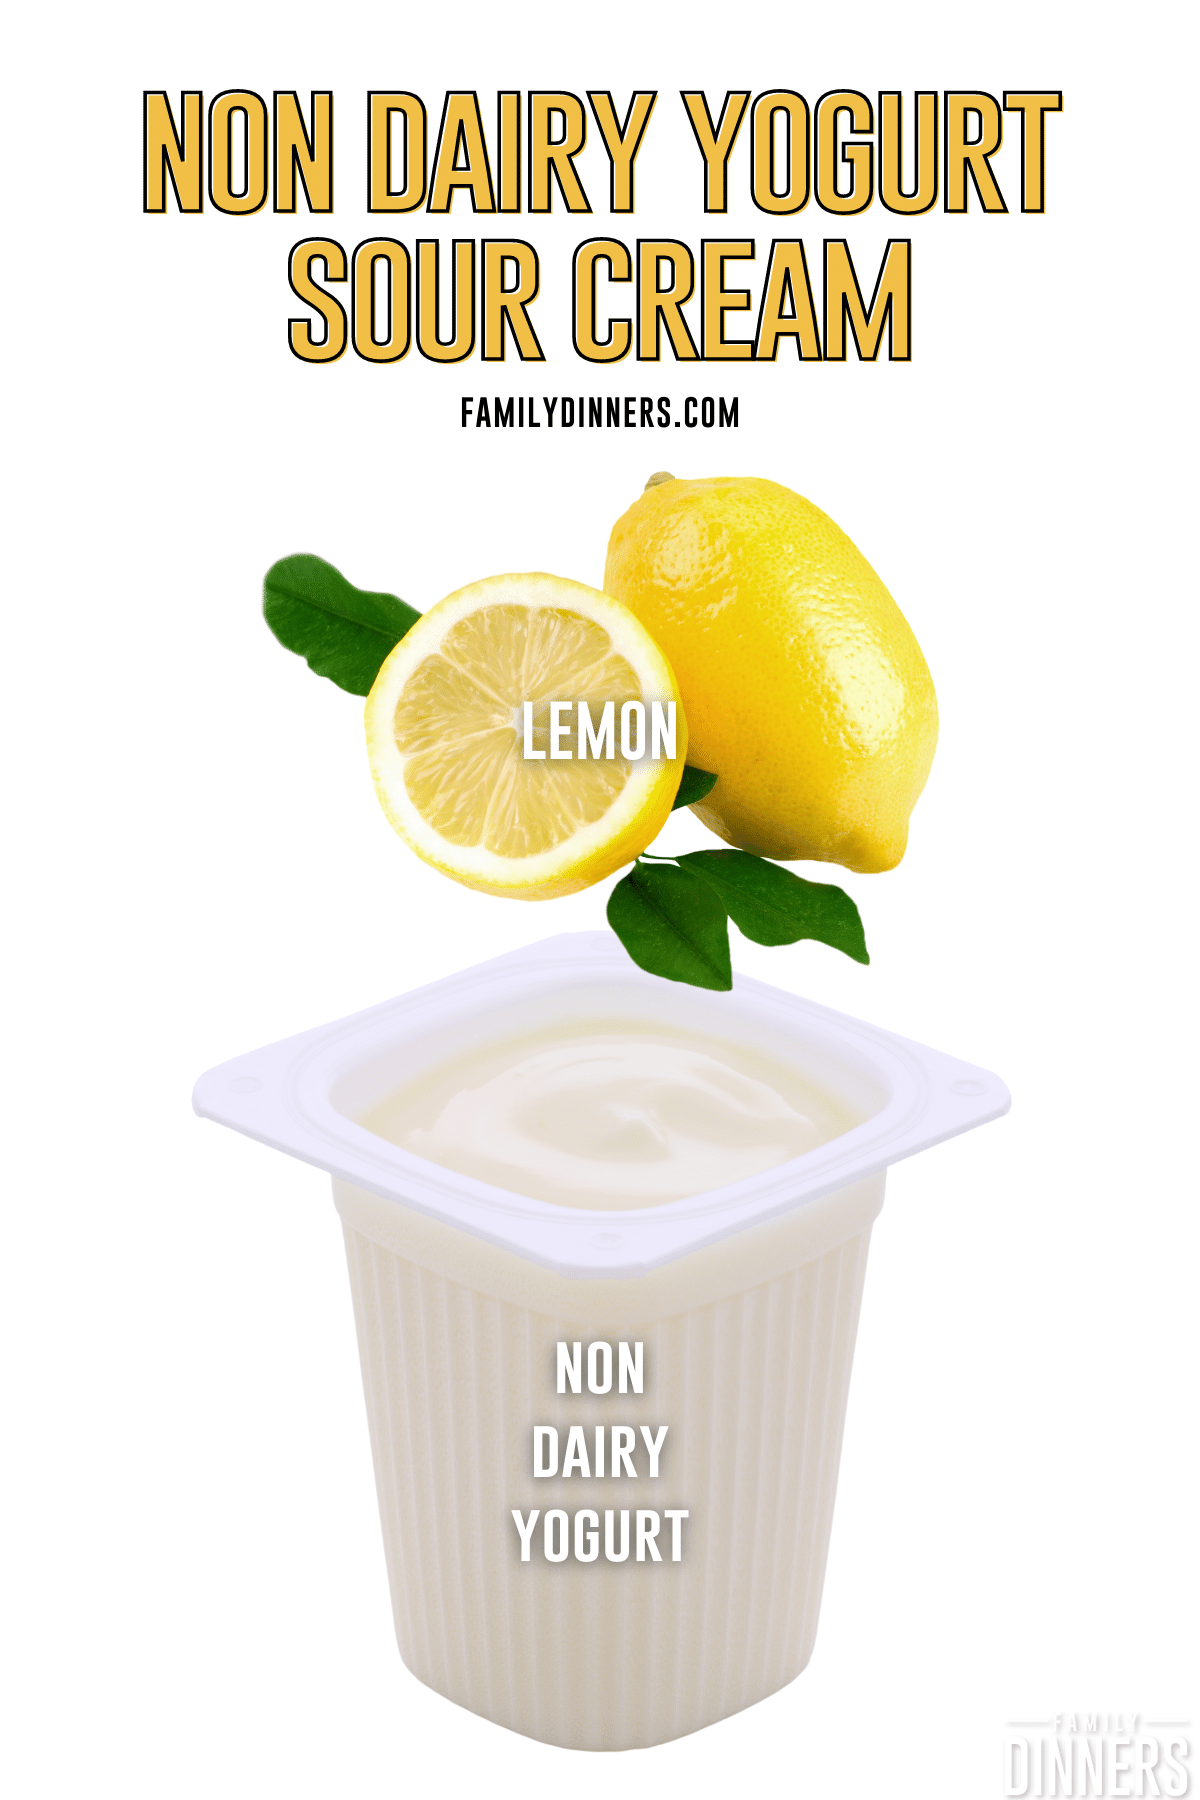 non dairy yogurt sour cream ingredients - lemon and non dairy yogurt